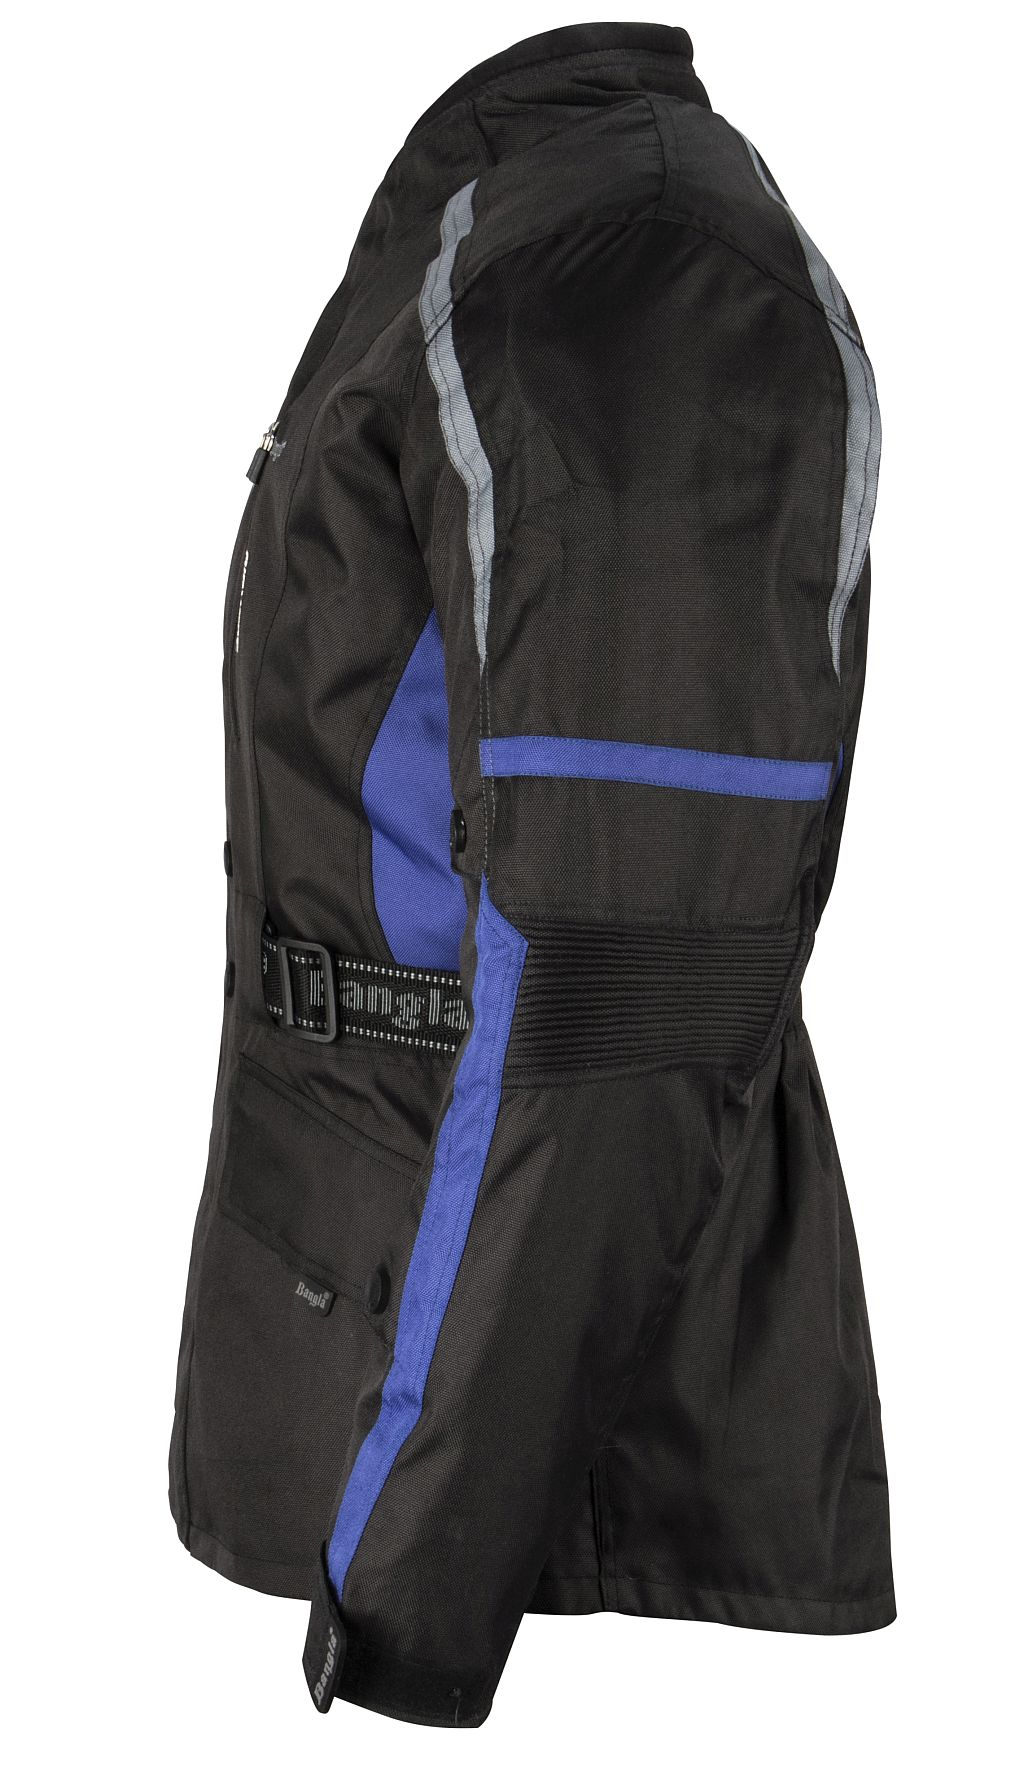 Bangla Motorradjacke Motorrad Jacke Textil Cordura schwarz blau grau M - 6 XL